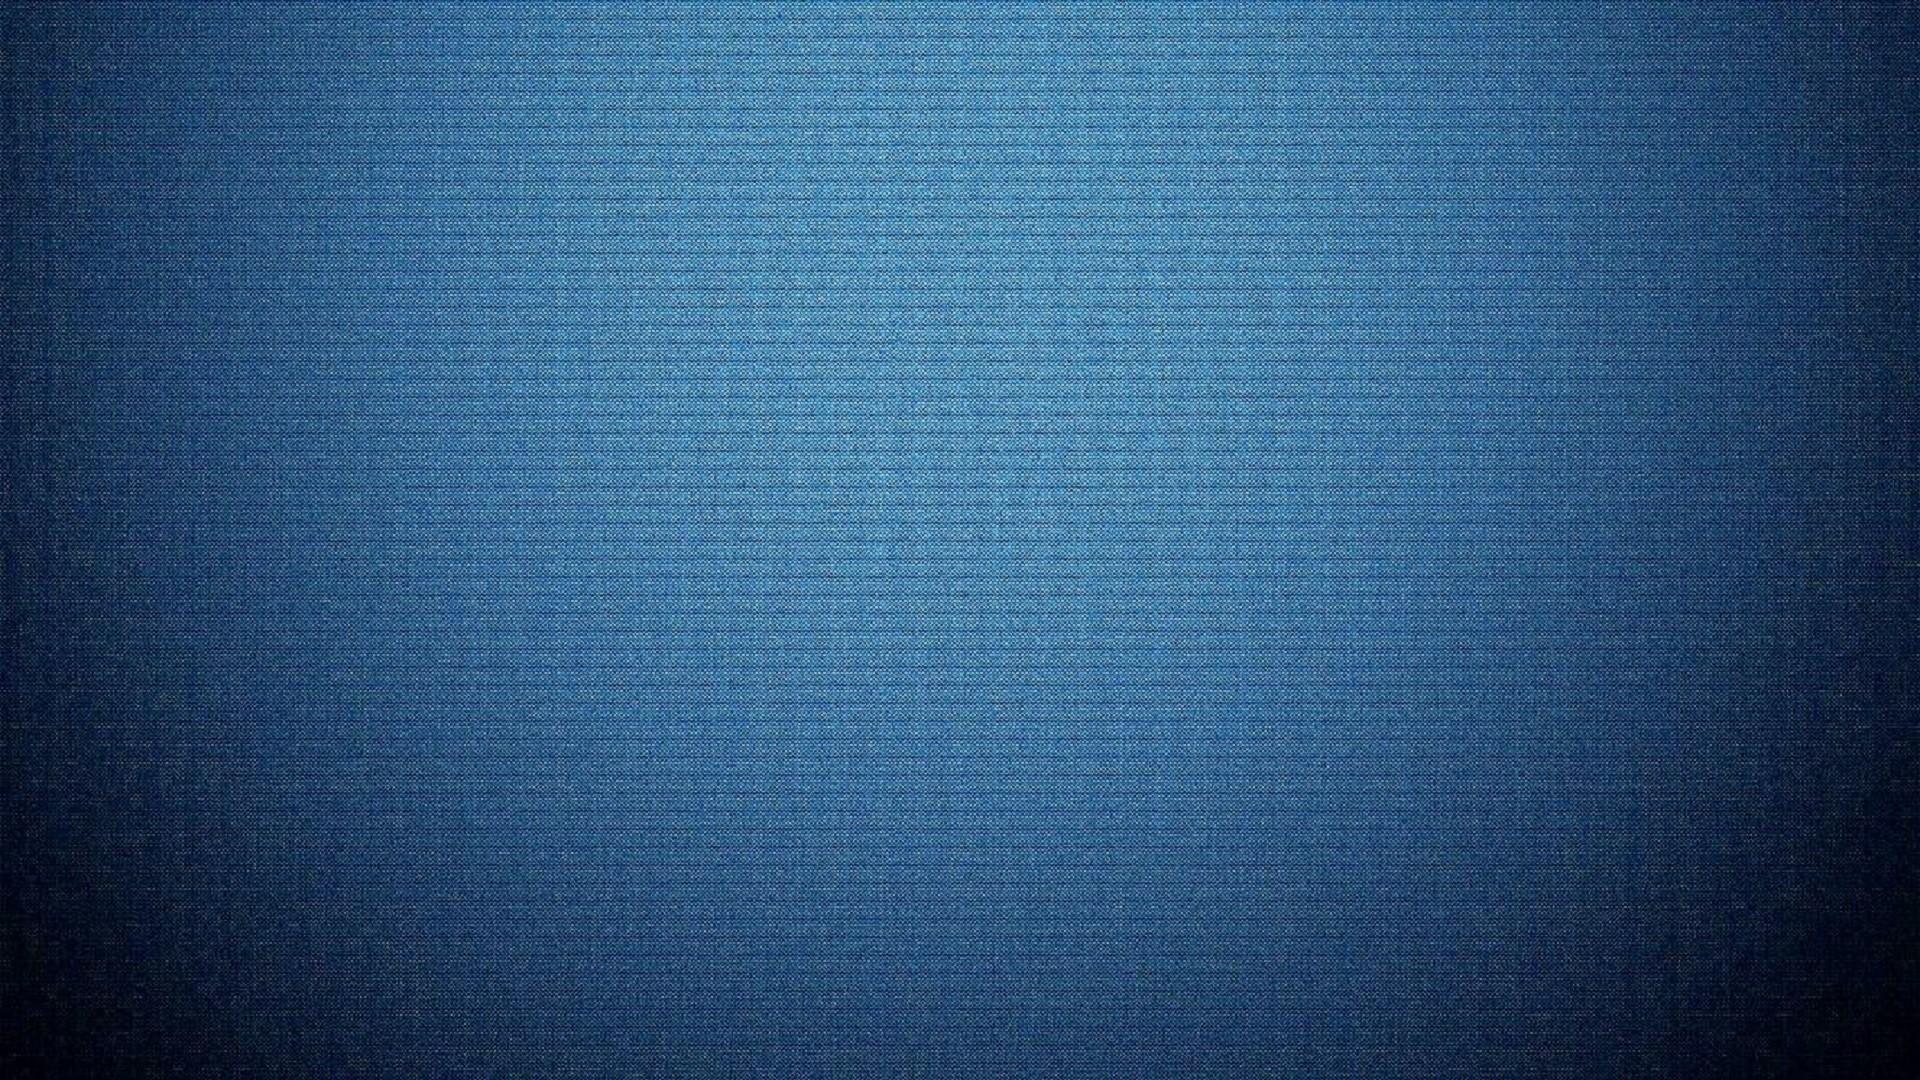 Plain Blue Full HD Wallpaper